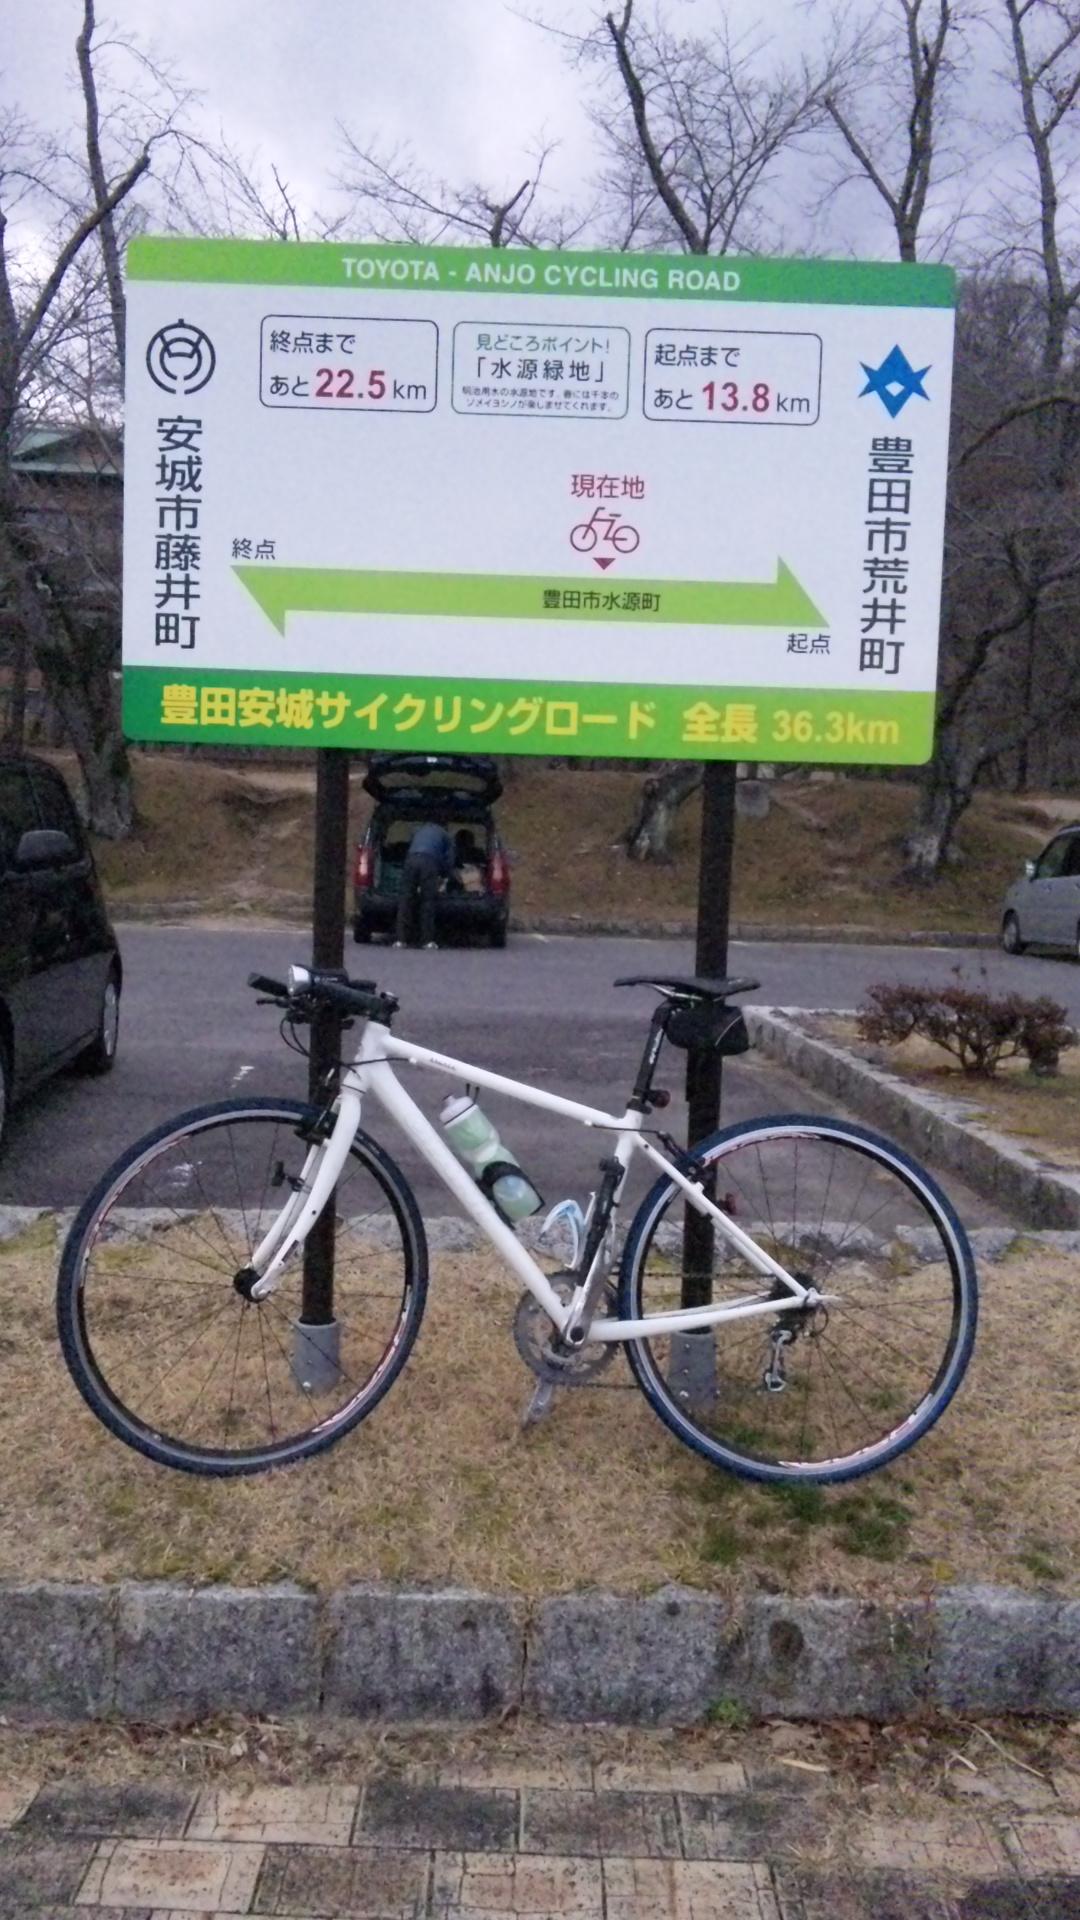 R3安城〜豊田自転車道80Km